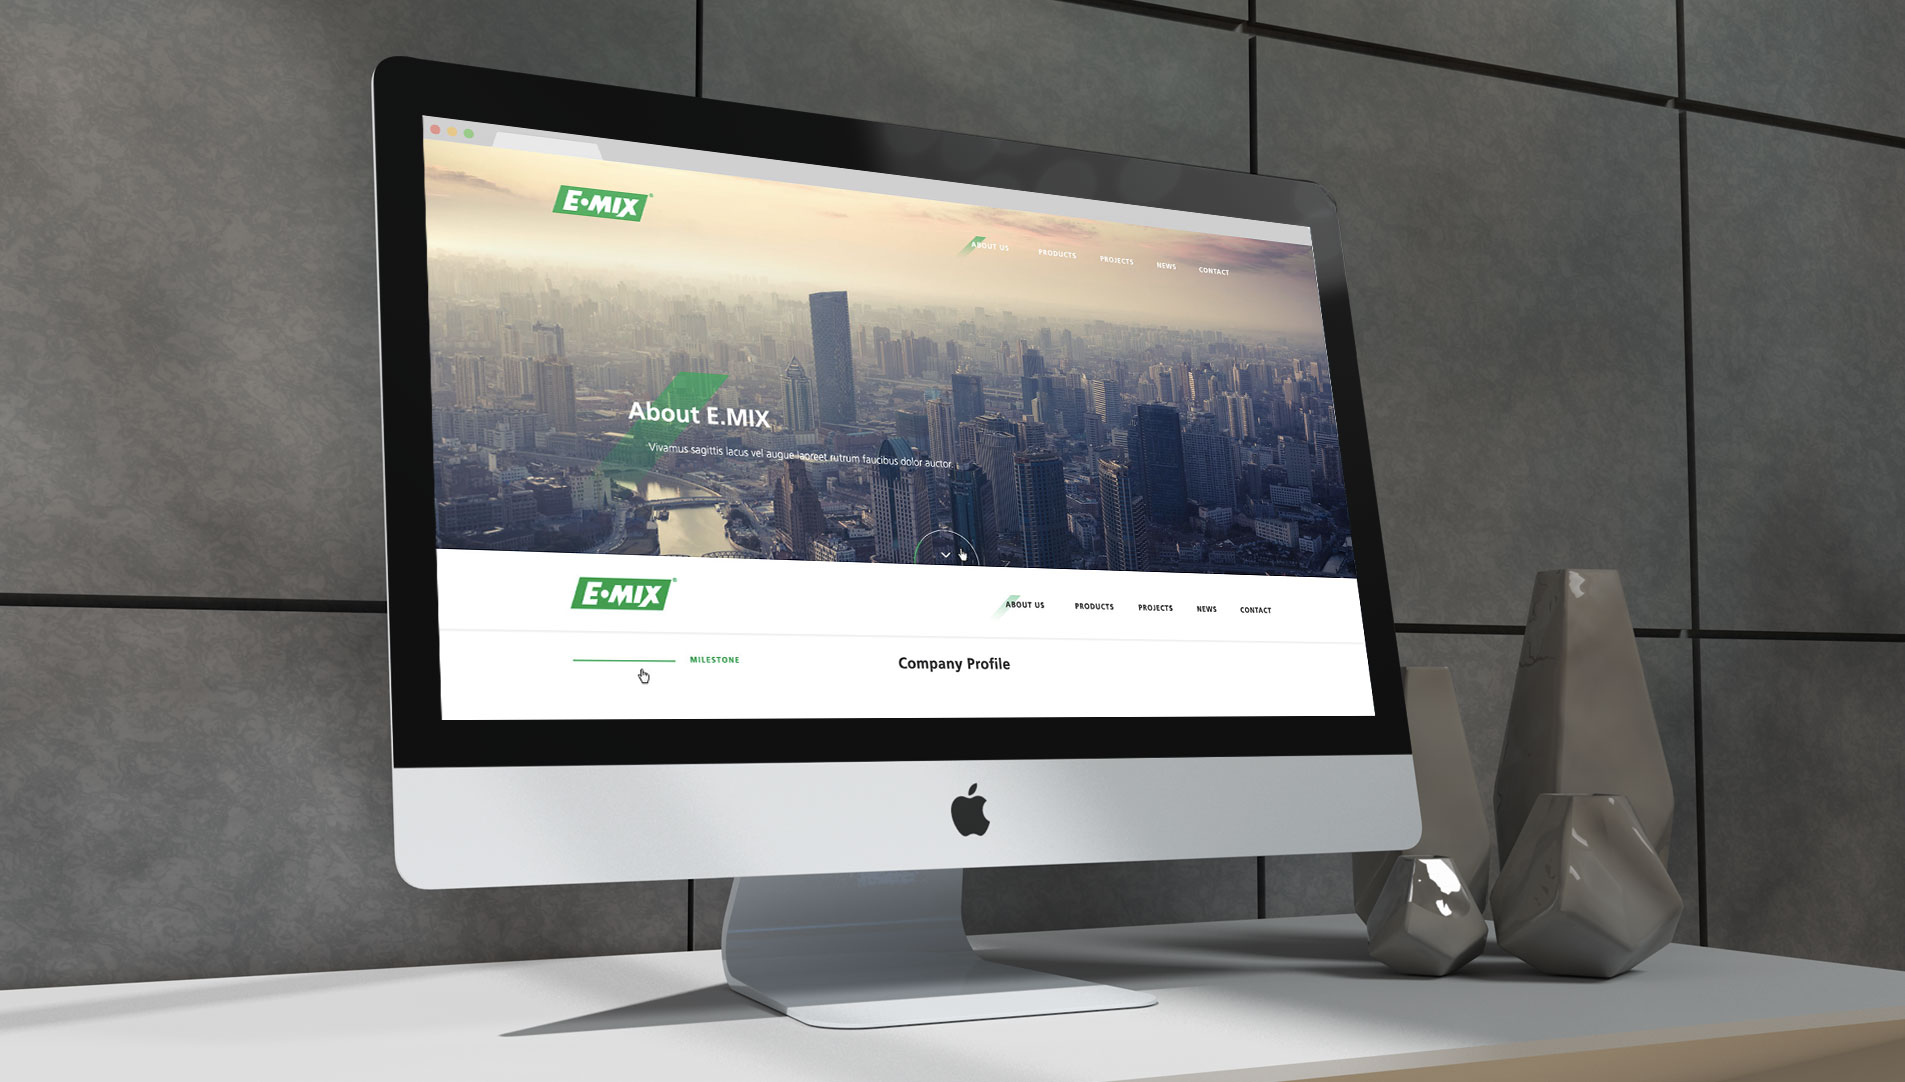 web design hong kong emix slideshow 03